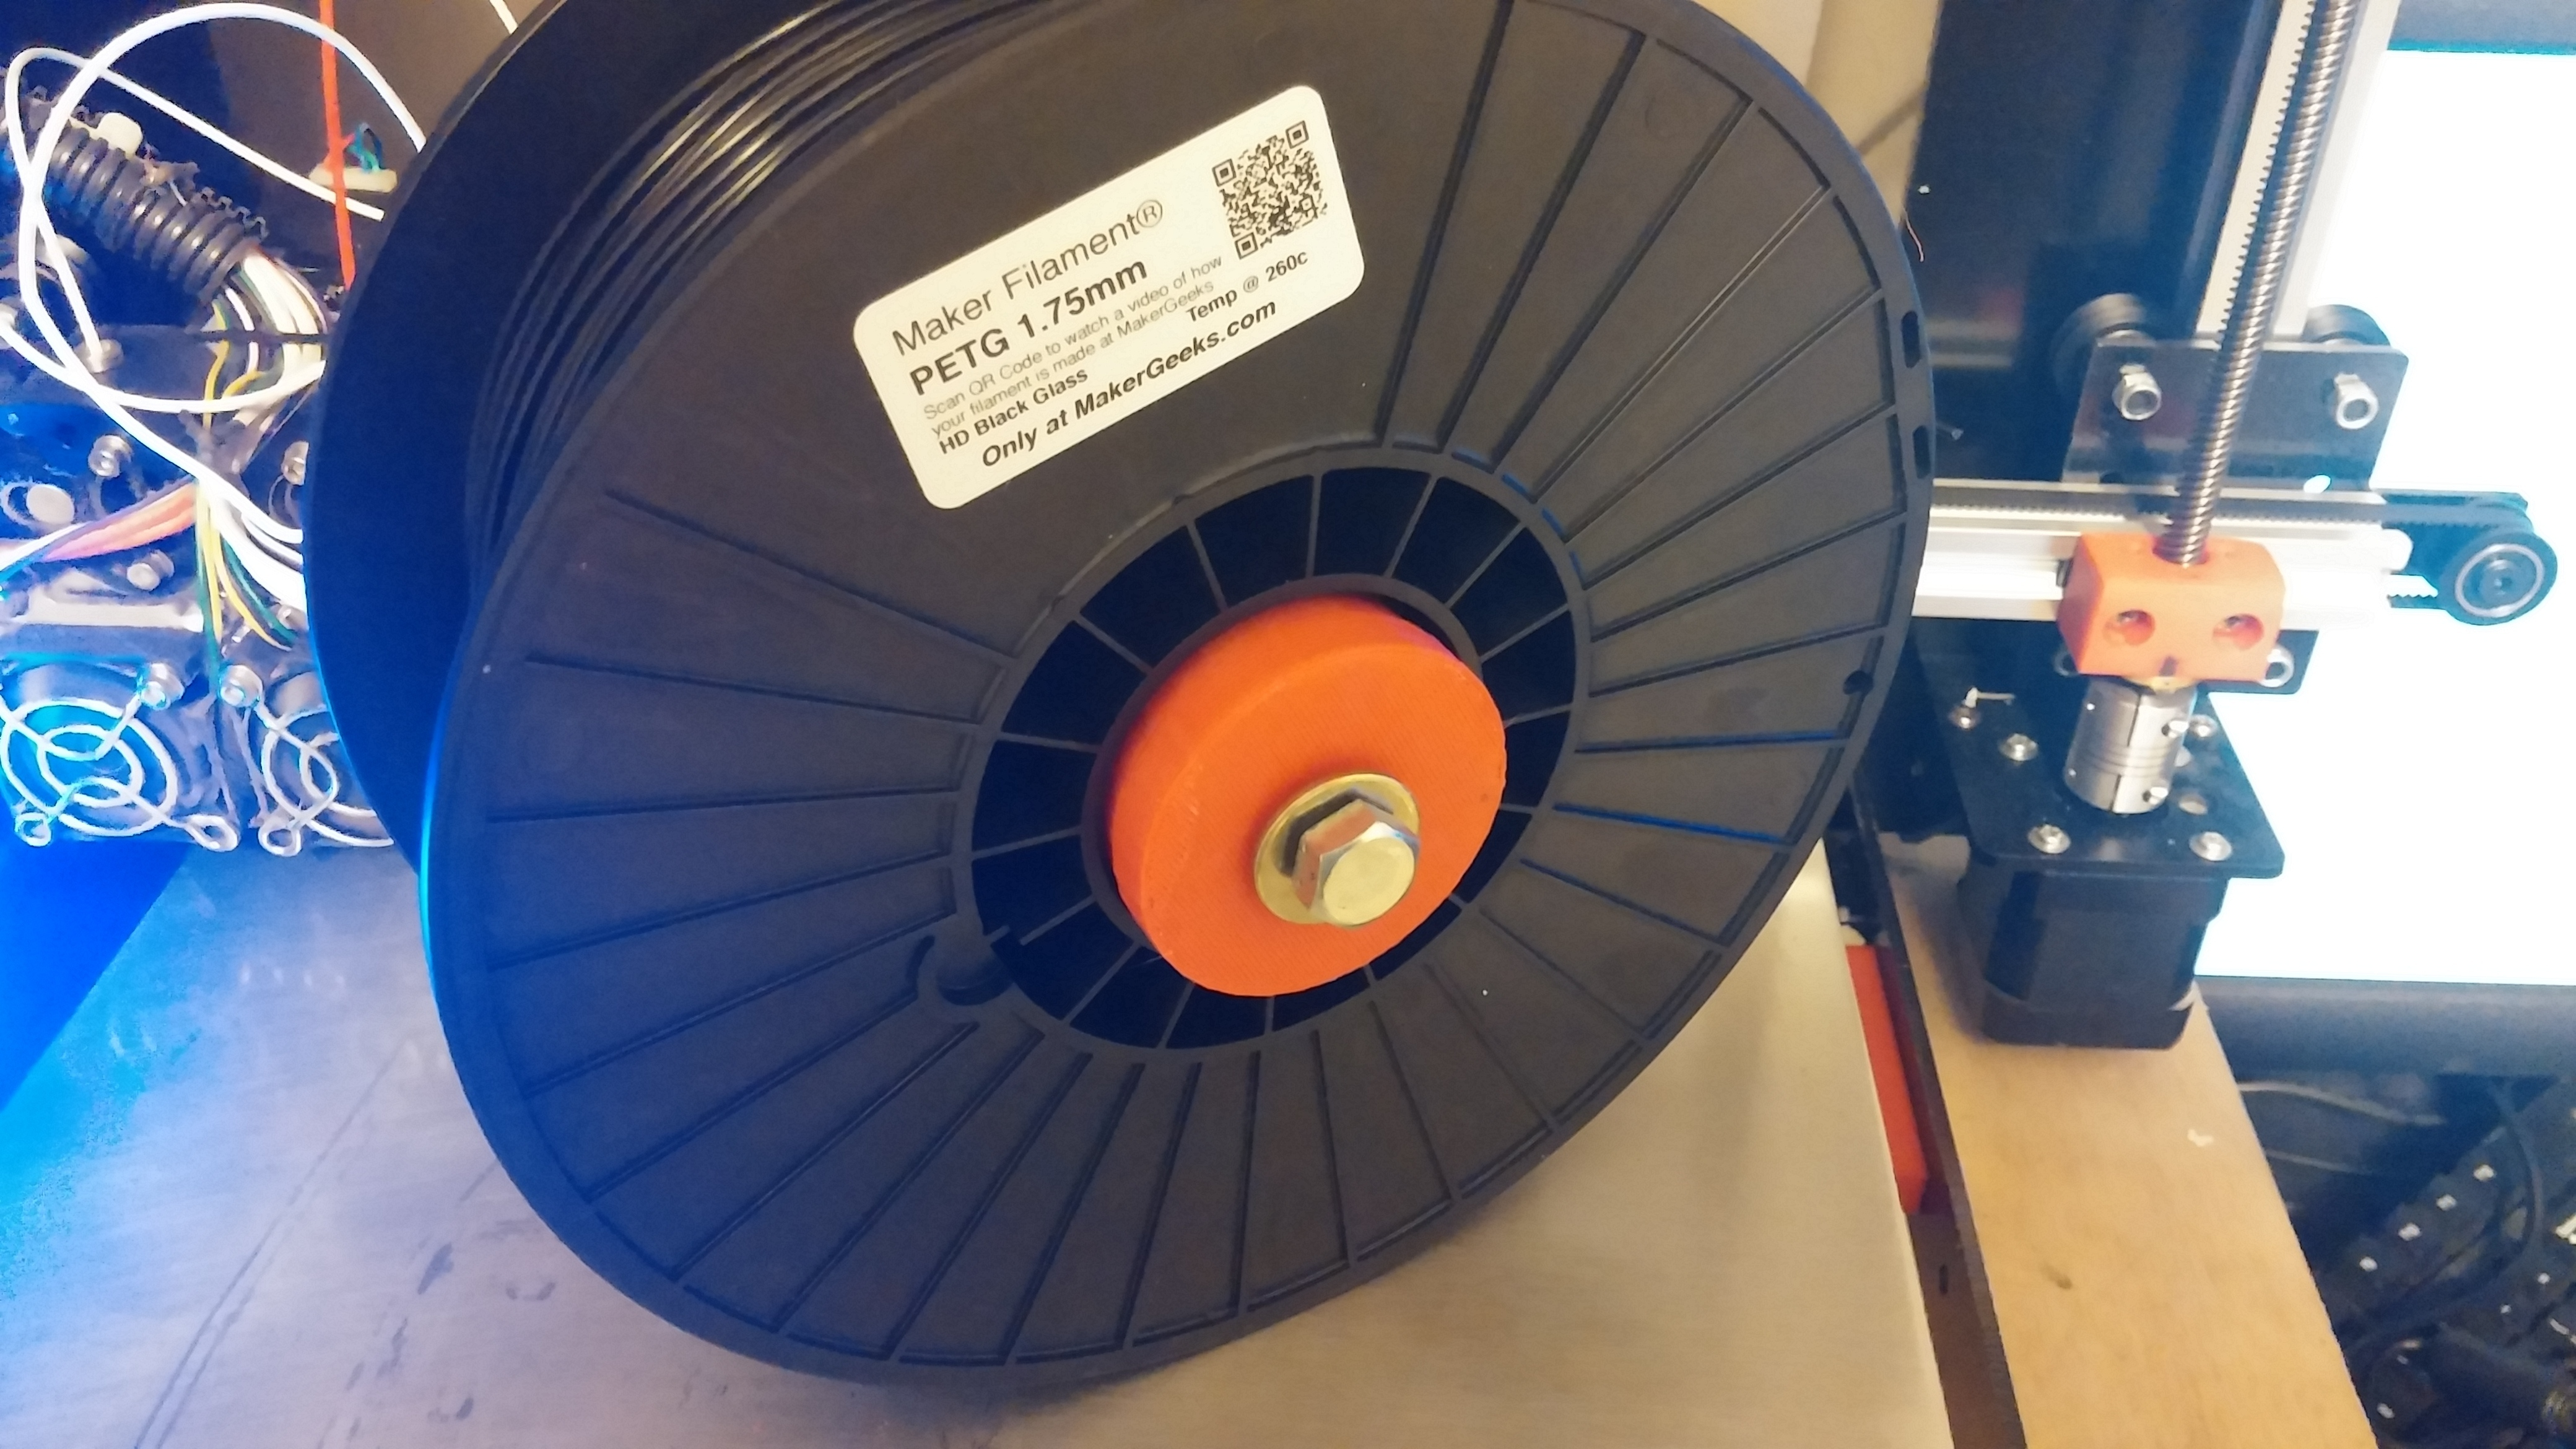 0701161415.jpg Download free STL file NCS P3-v Steel 51mm dia Spool Insert • Object to 3D print, trentjw